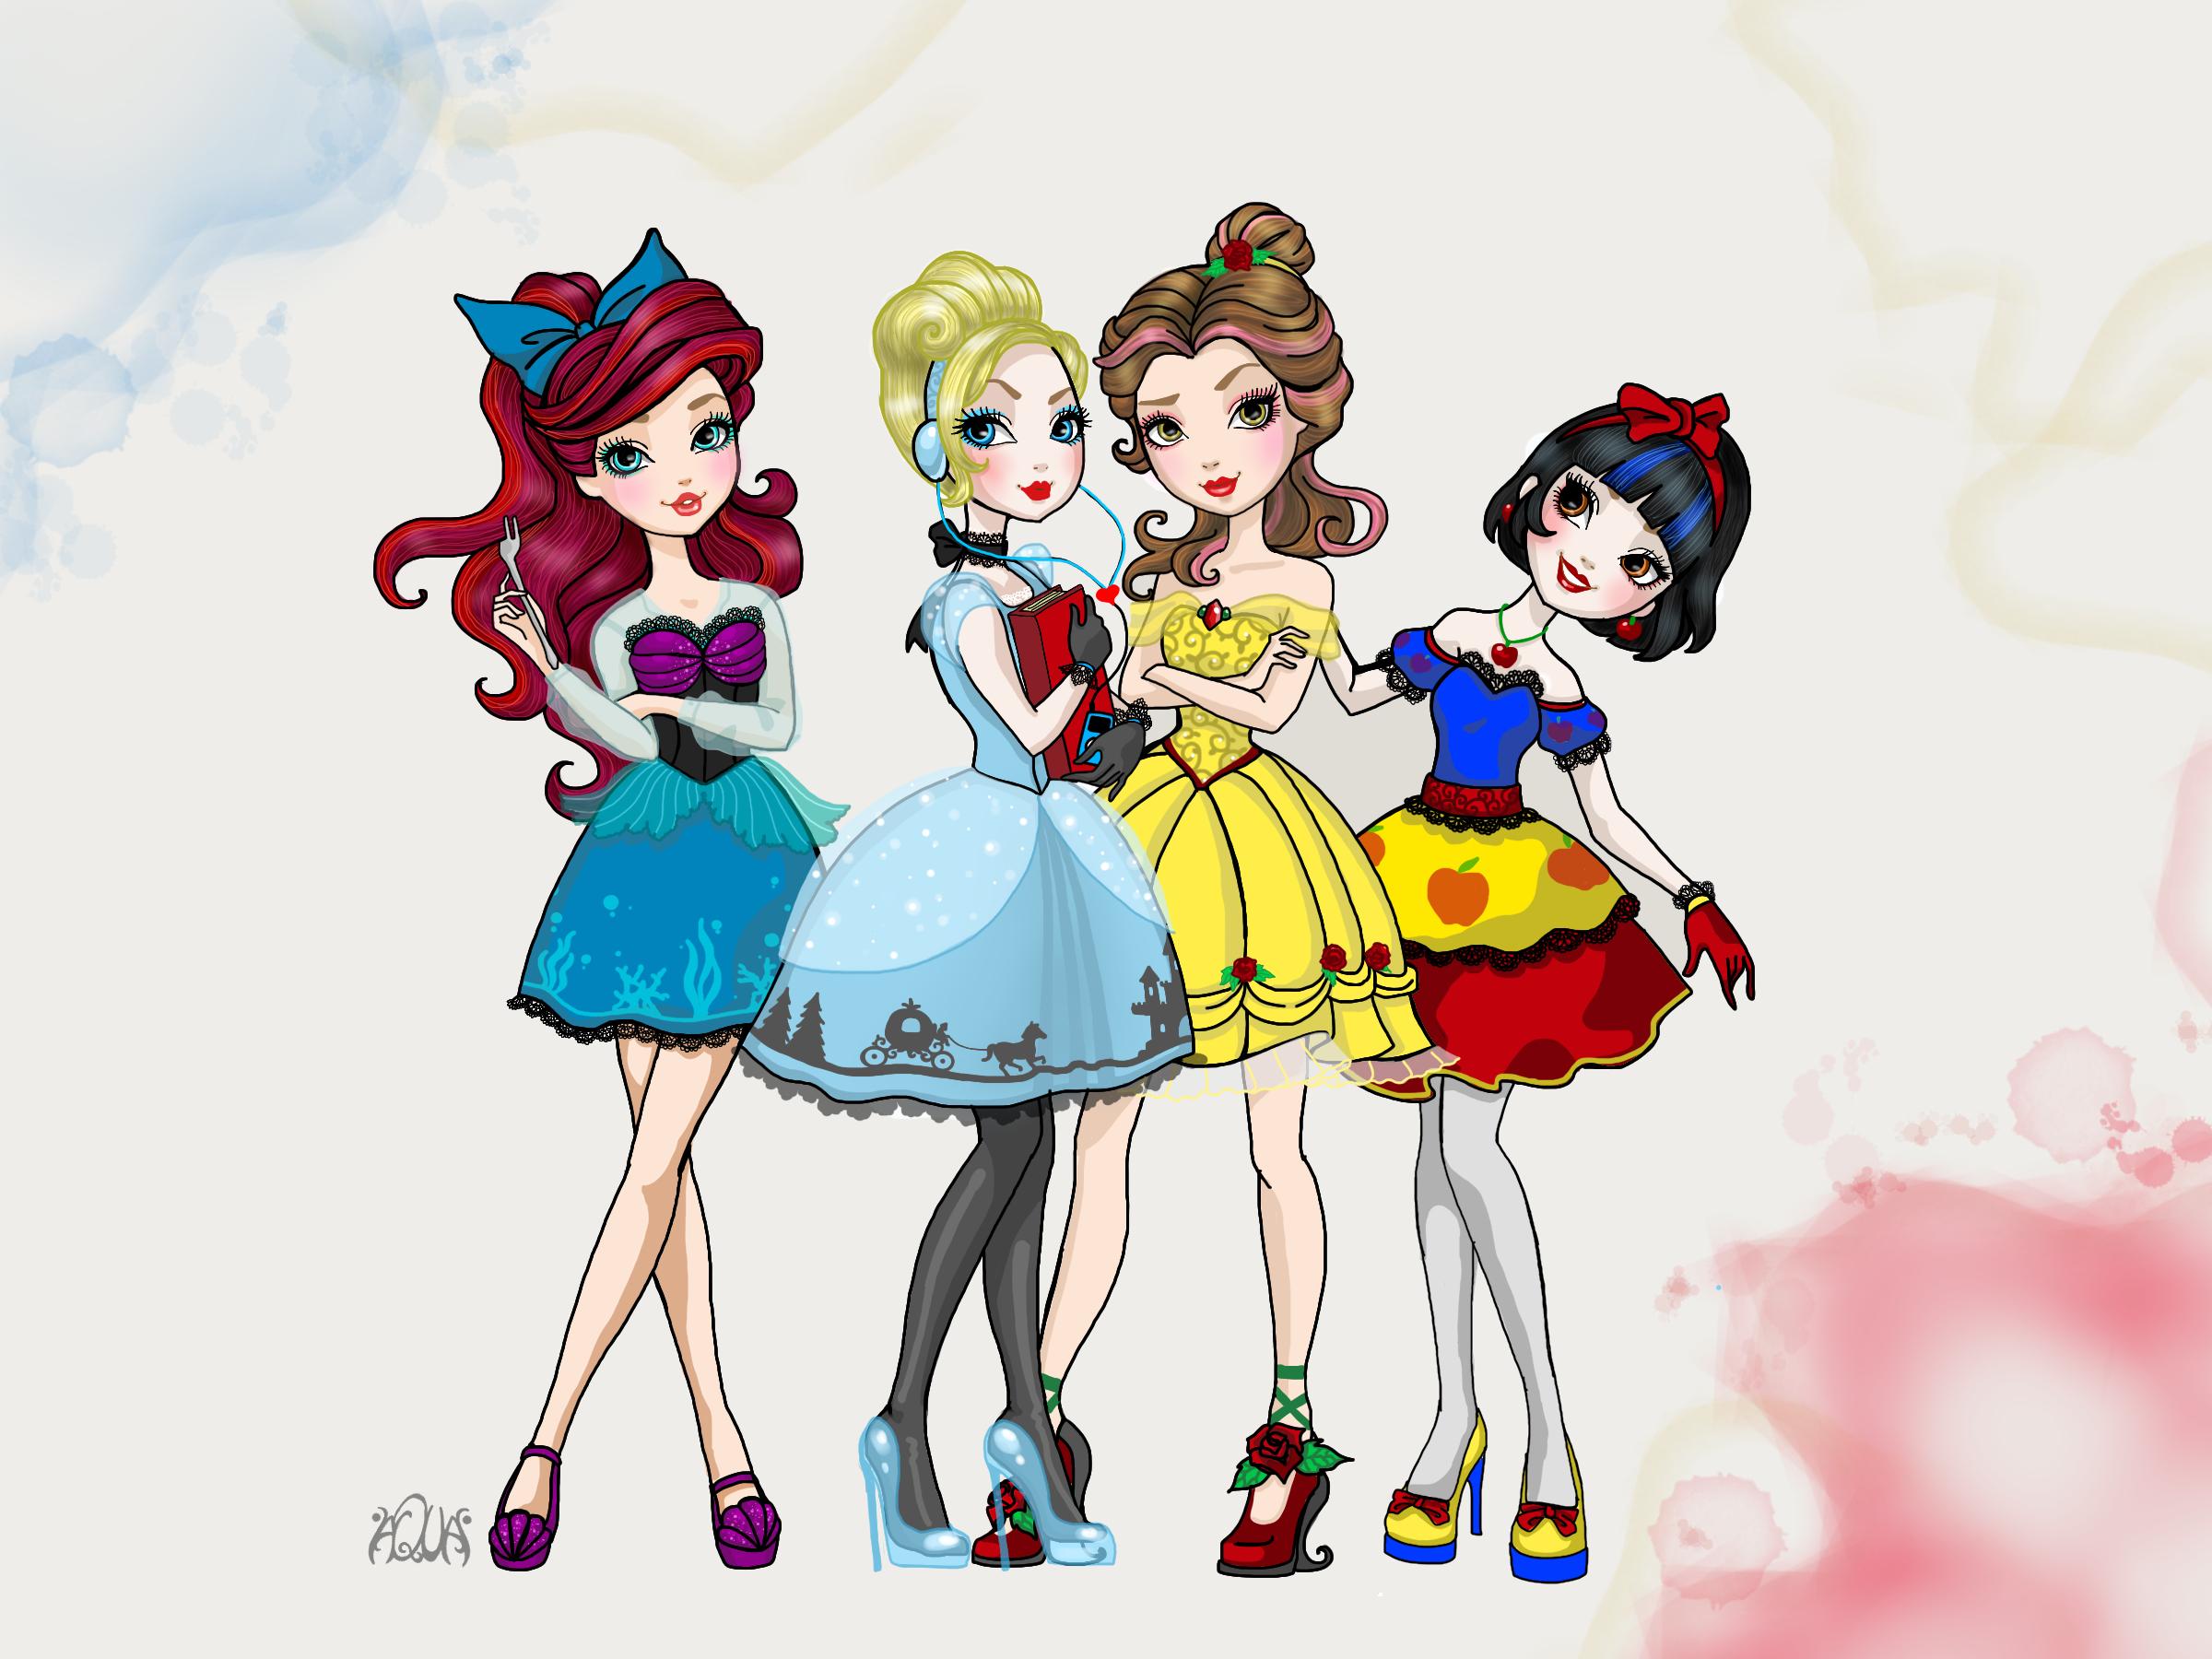 Disney princess ever after by 0aqua mermaid0 on deviantart disney princess ever after by 0aqua mermaid0 altavistaventures Choice Image